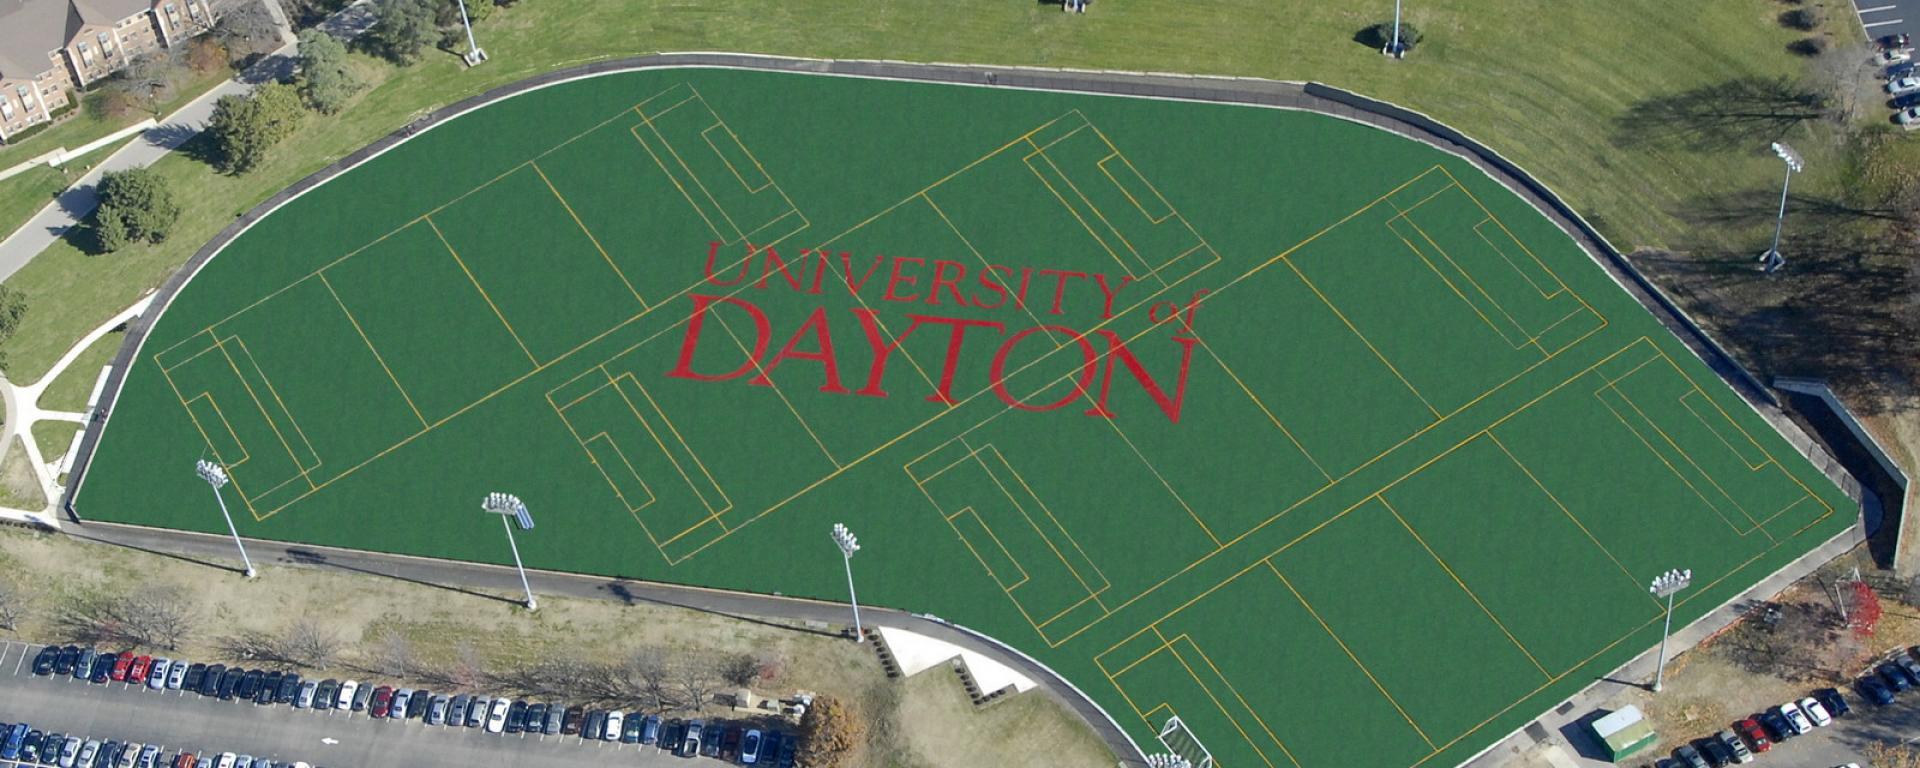 University of Dayton Stuart Field